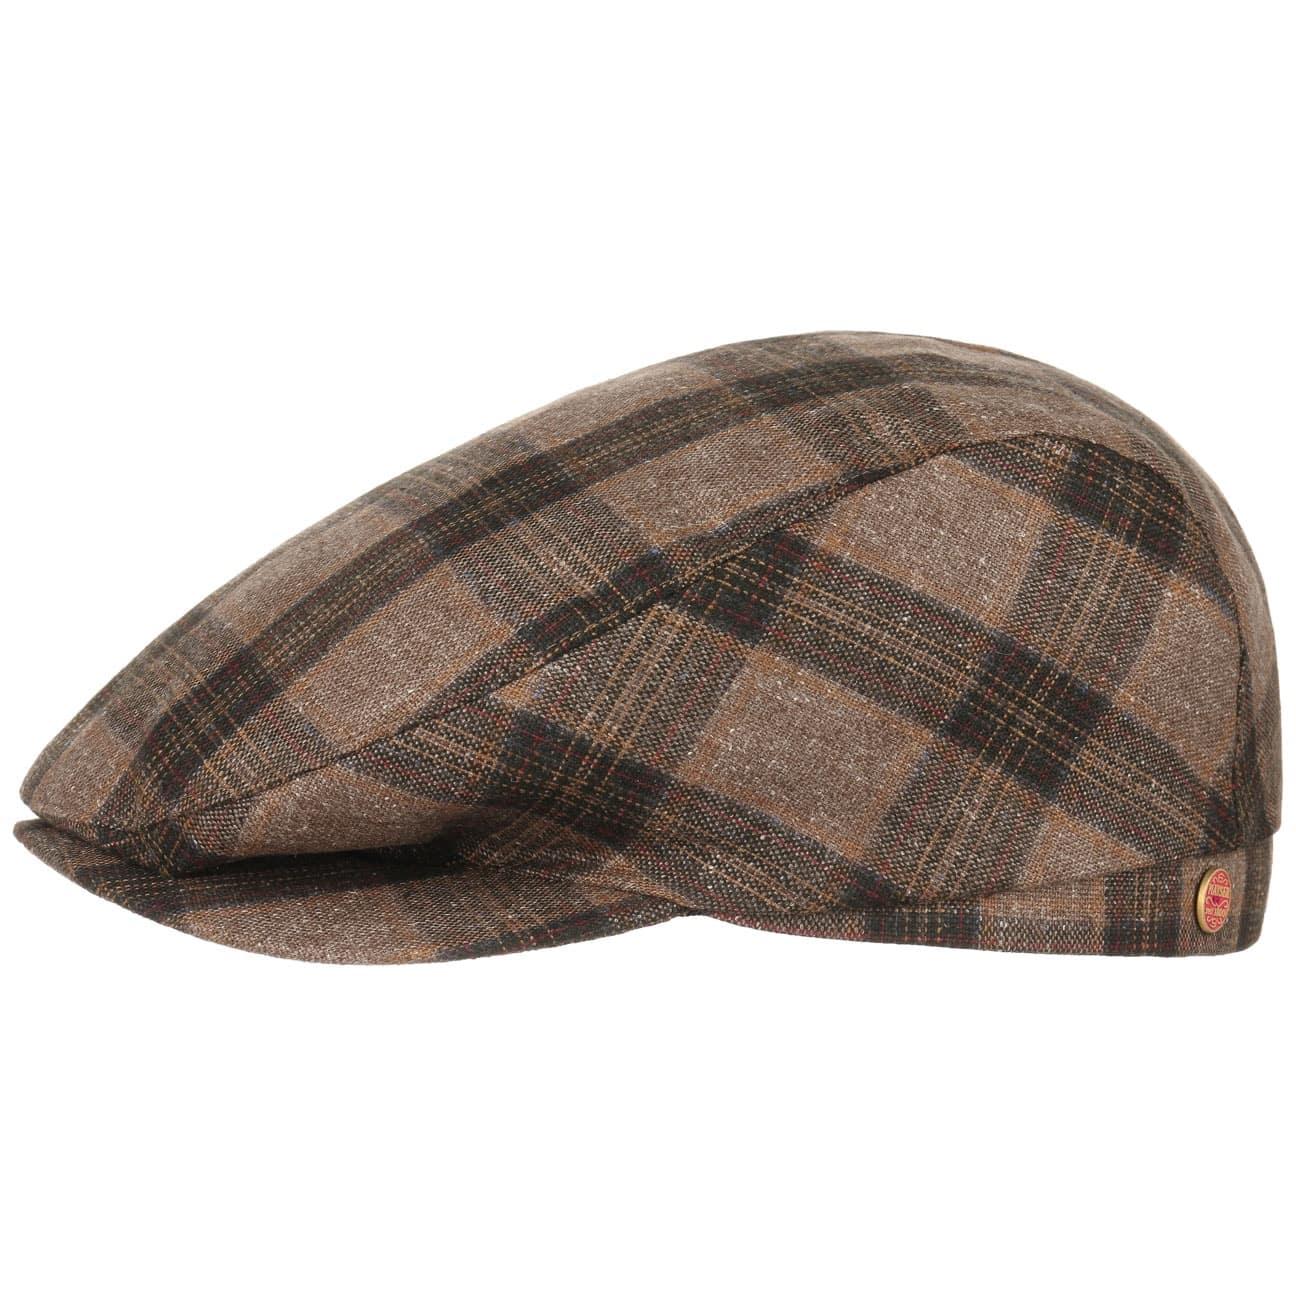 Gorra de Seda Franky Exclusive by Mayser  flat hat